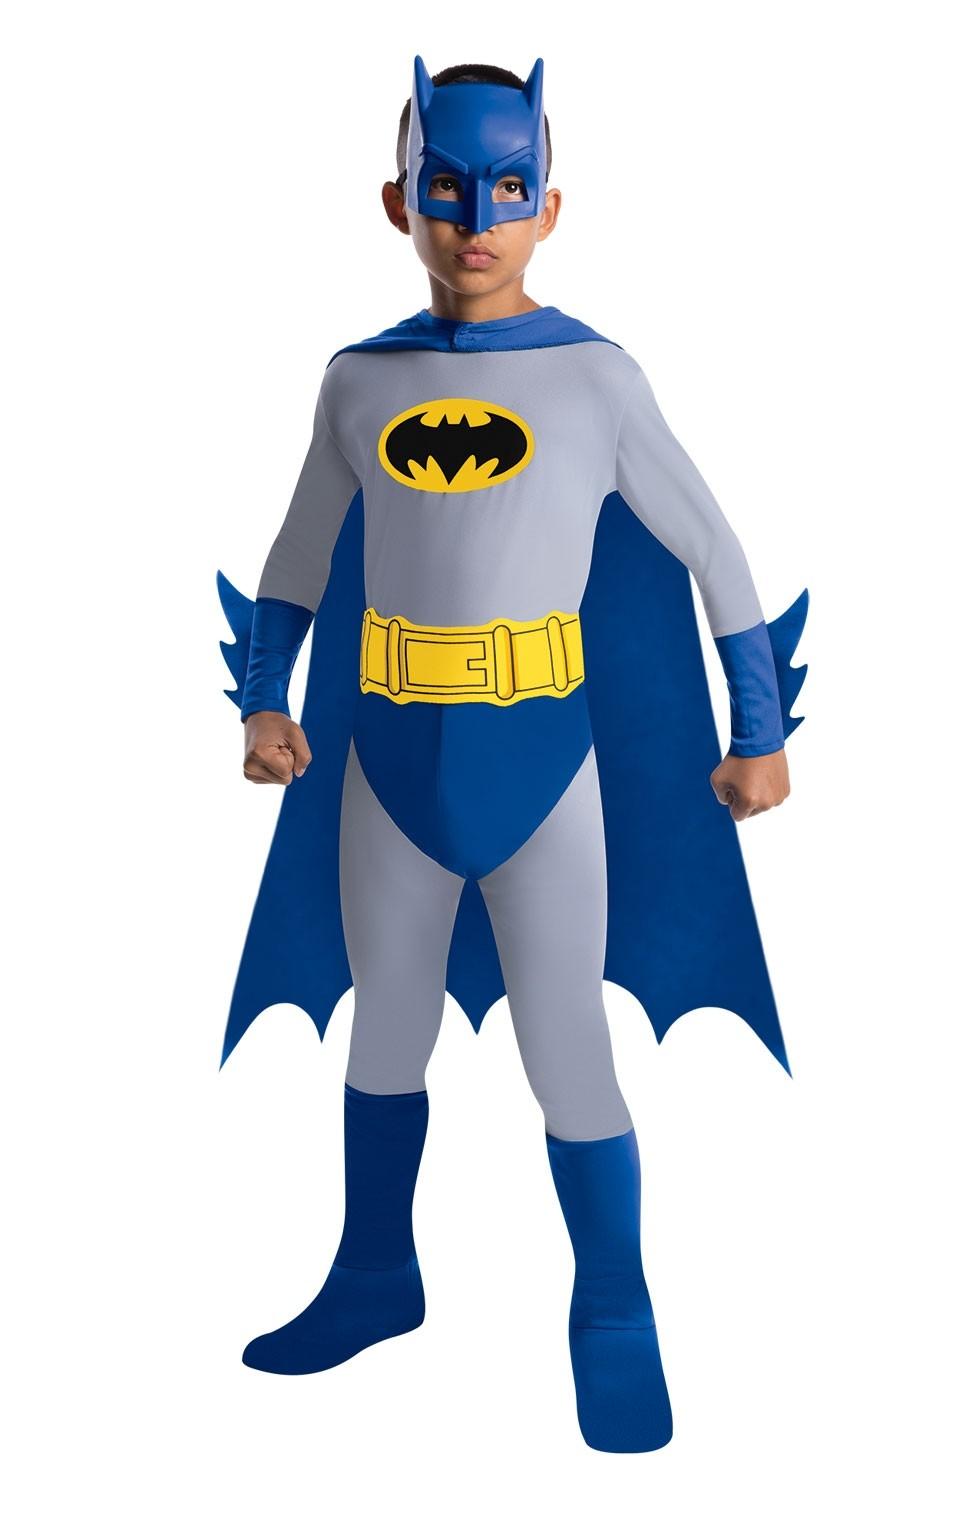 Костюм Бэтмена синий (32-34) детский костюм озорного клоуна 34